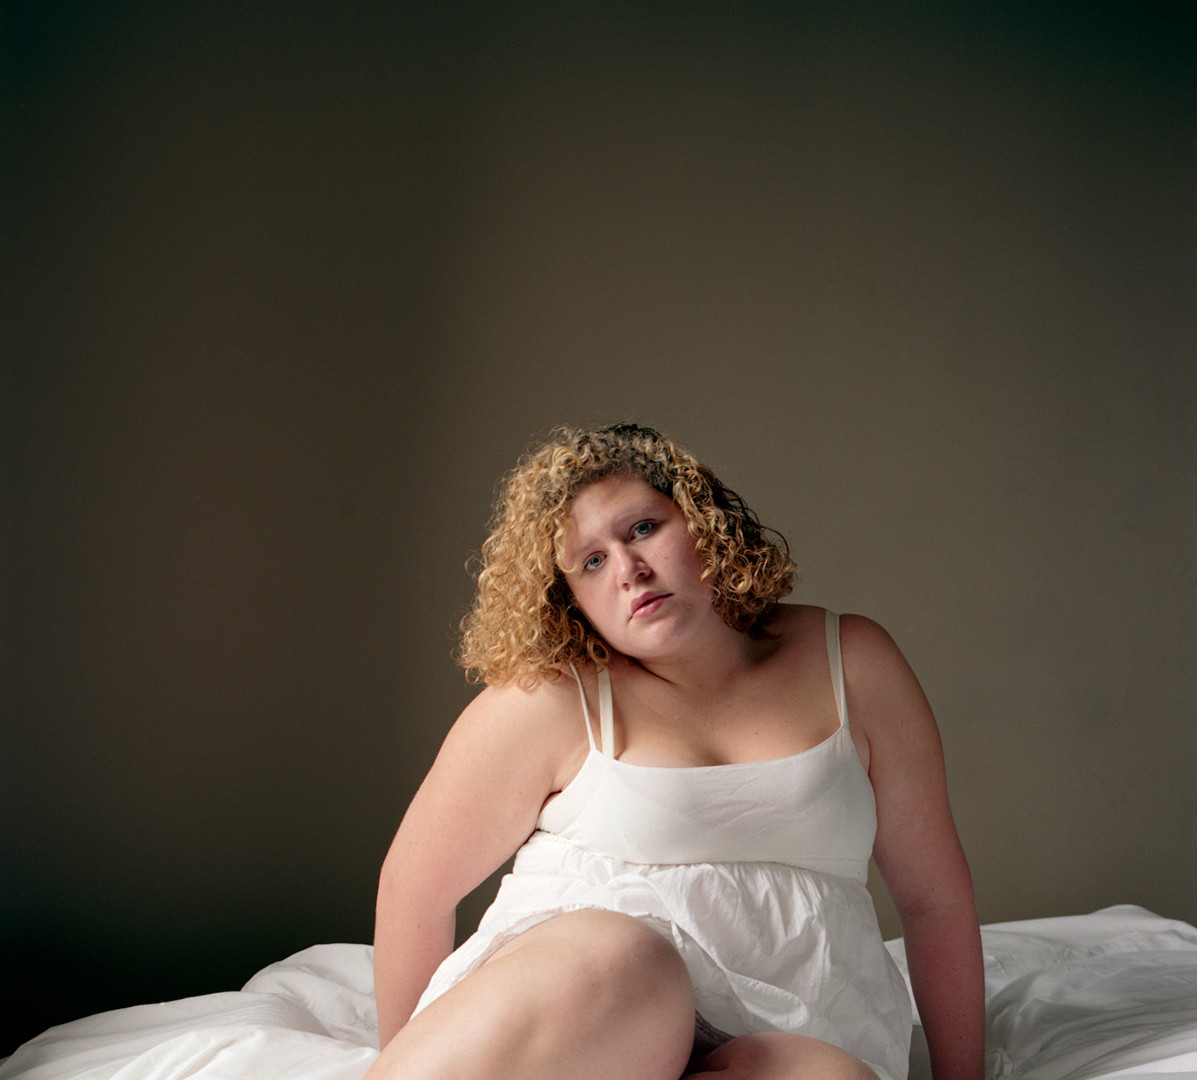 Jocelyn Lee, Untitled (Siggy at Chelsea Hotel), 2009